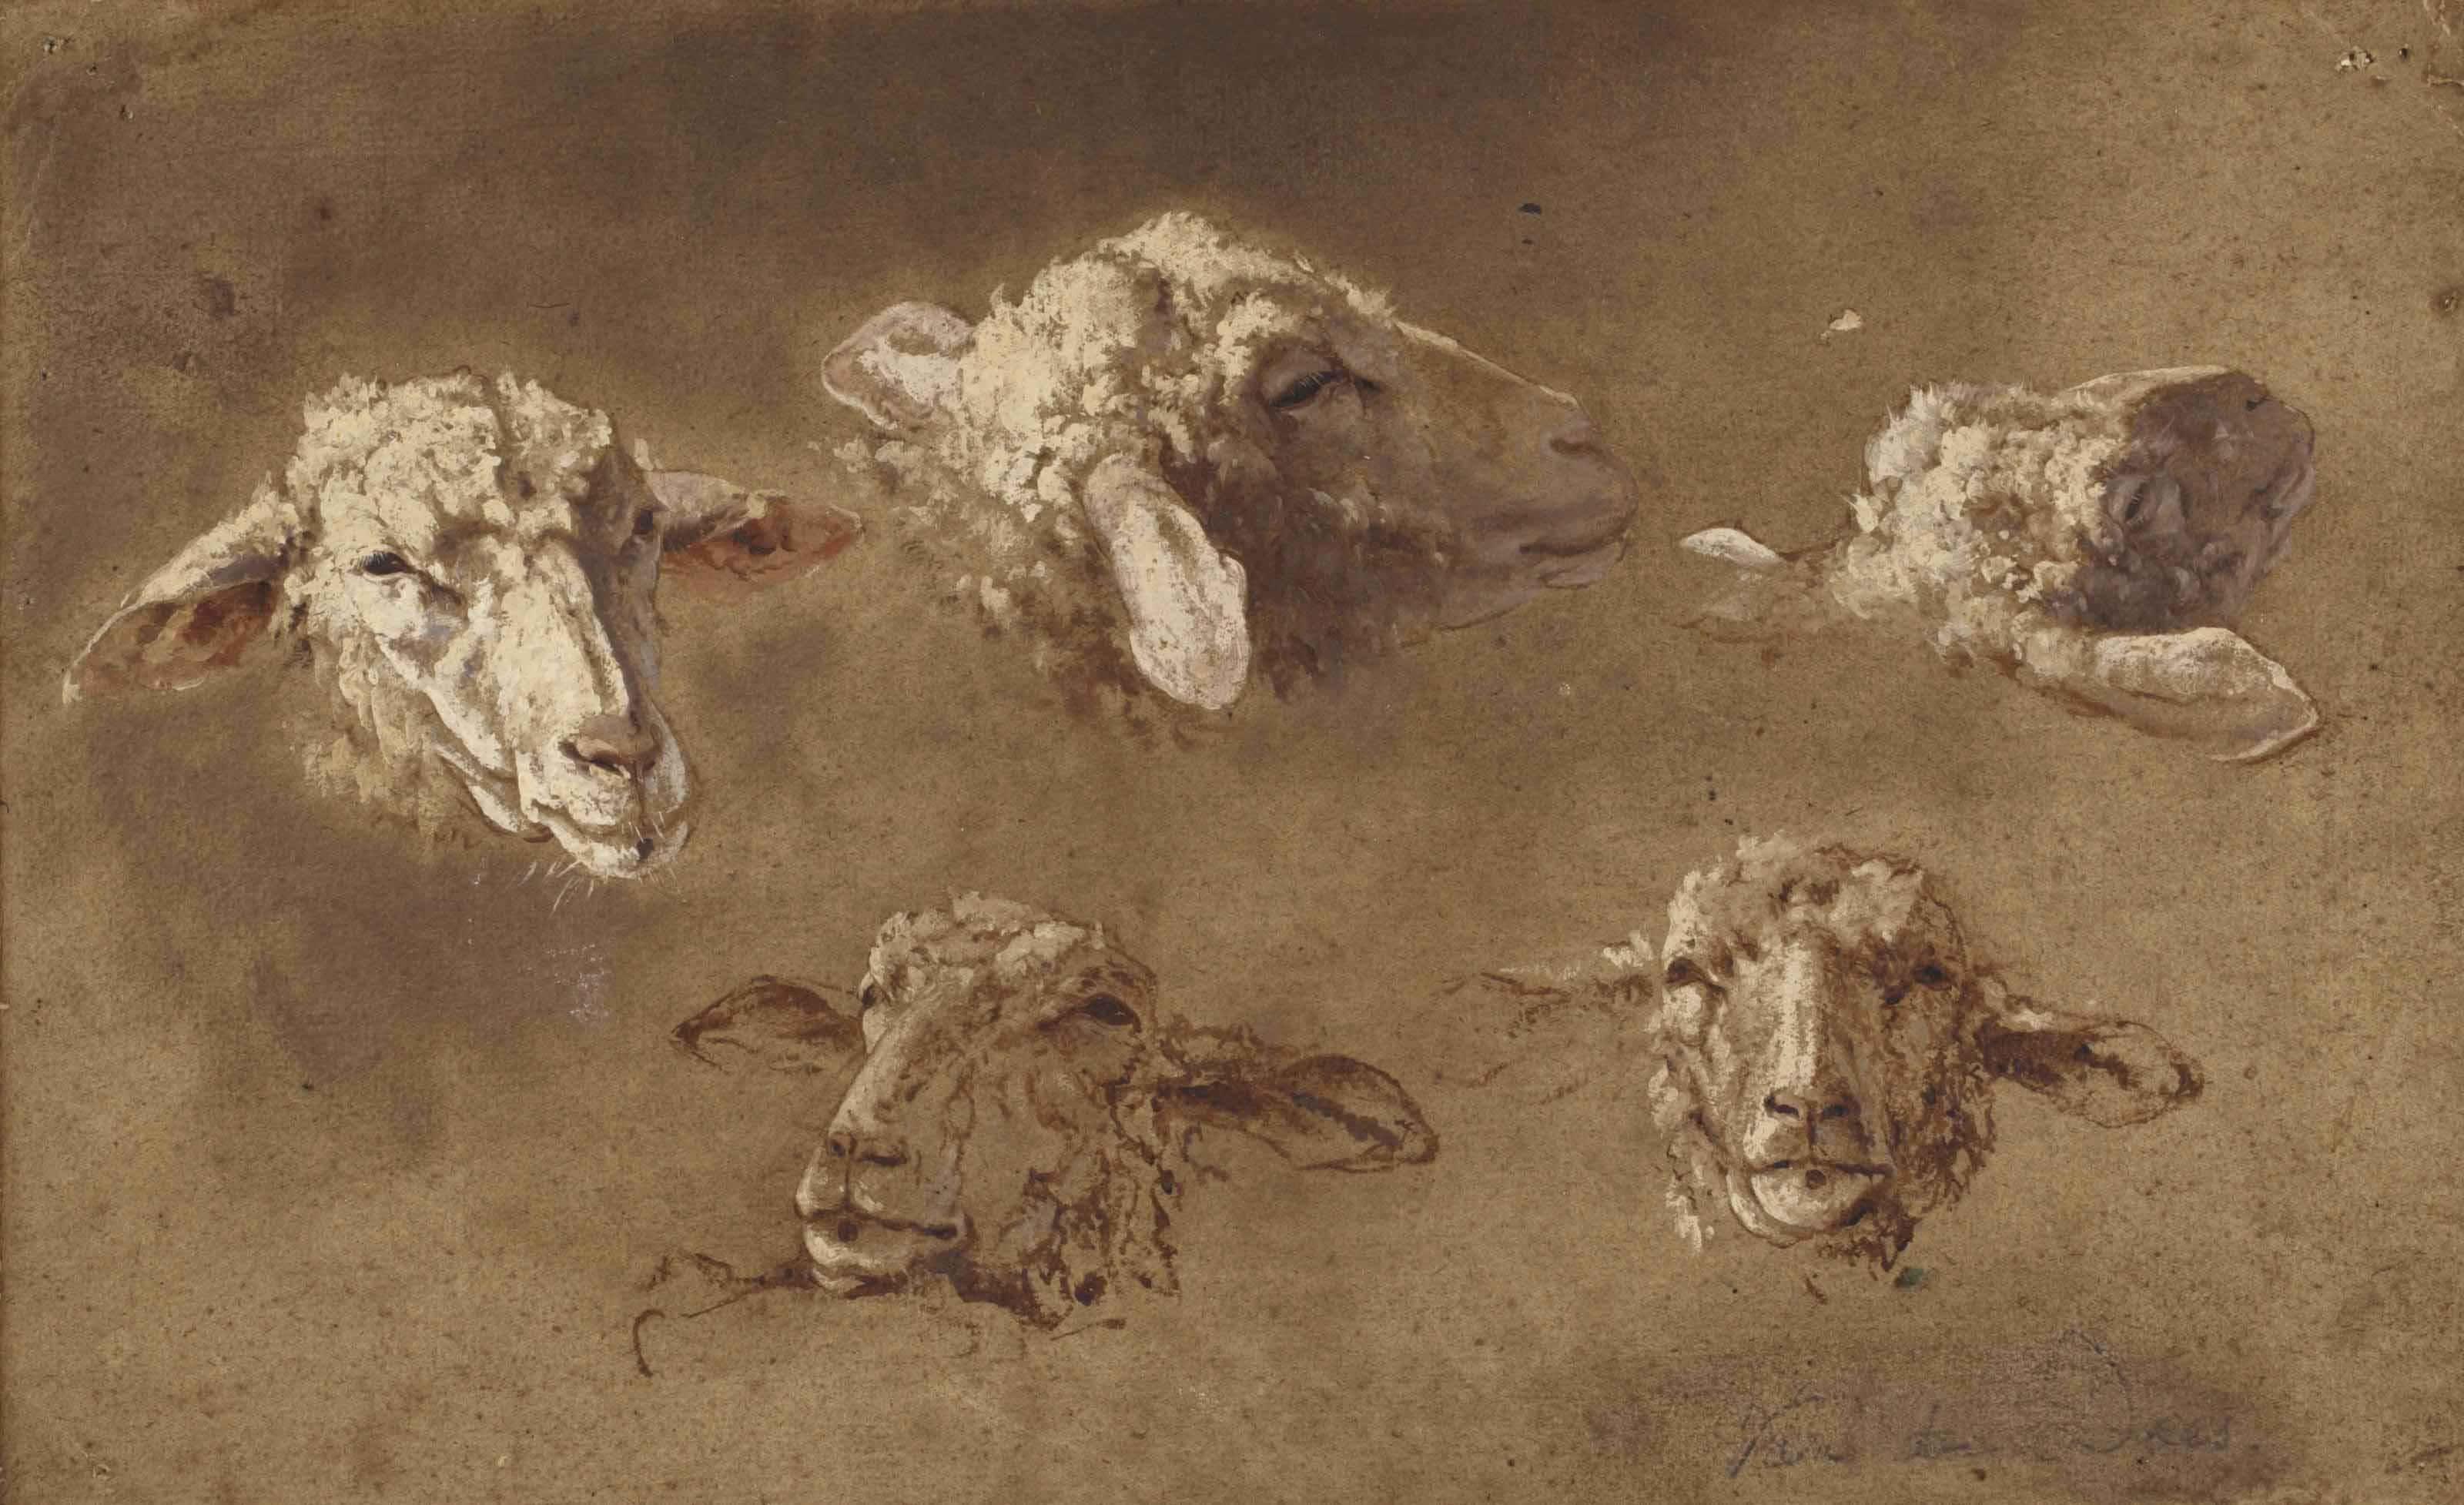 Simon van der Does (1653-after 1718)